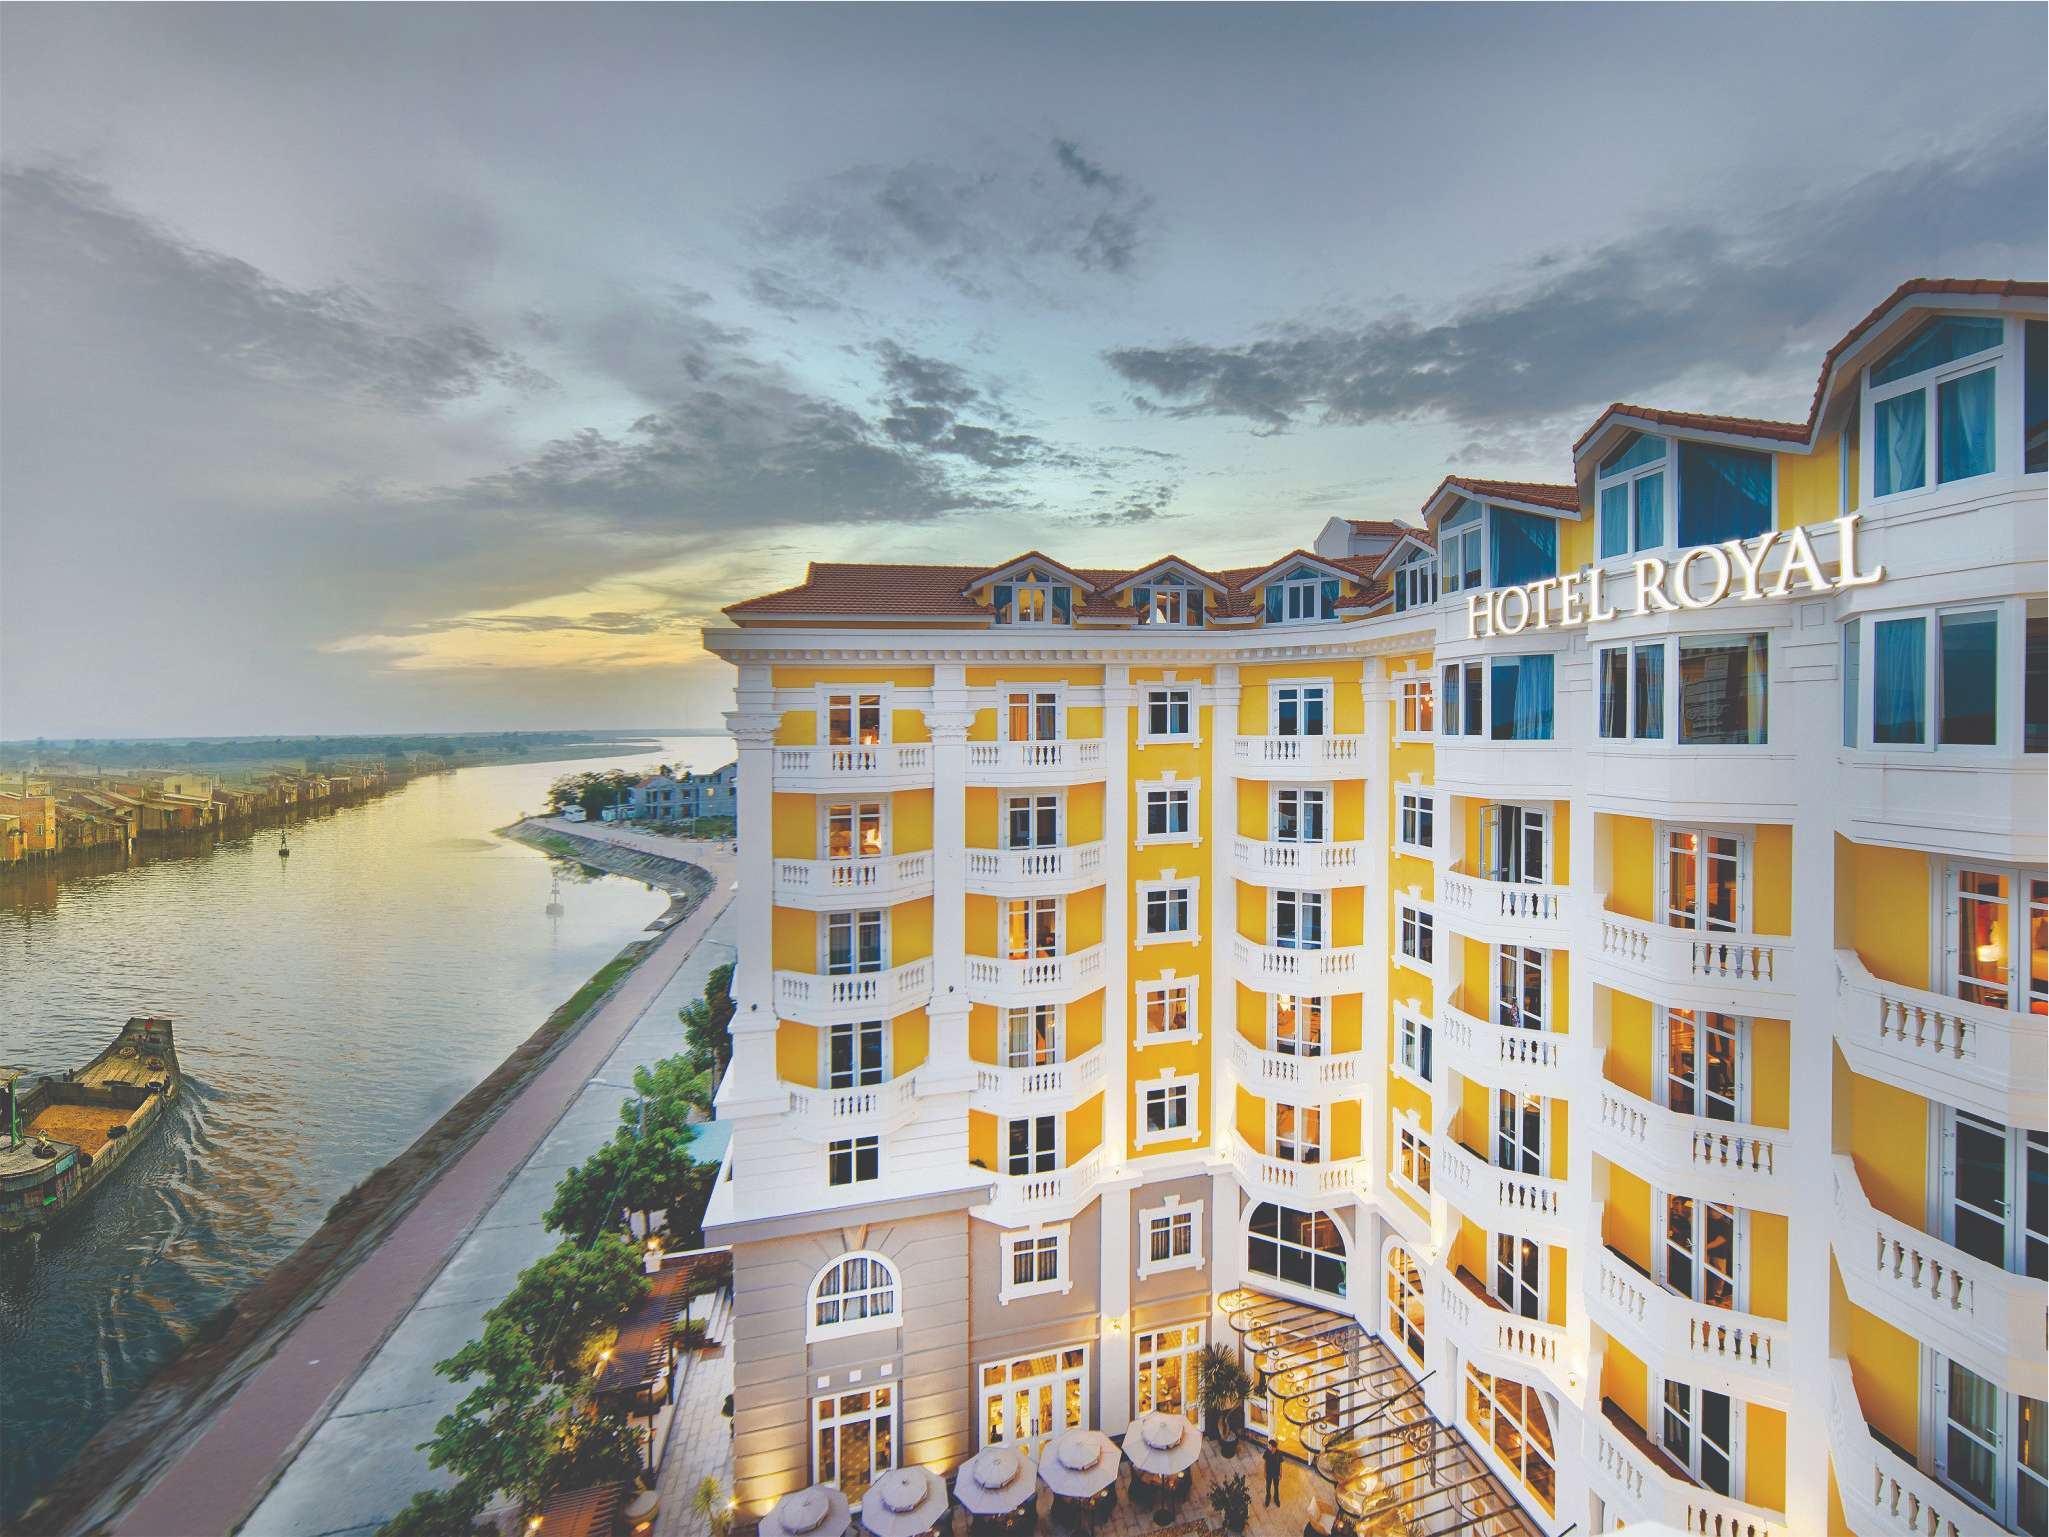 Hotel Royal Hoi An giới thiệu sự kiện bữa tối Escoffier 4